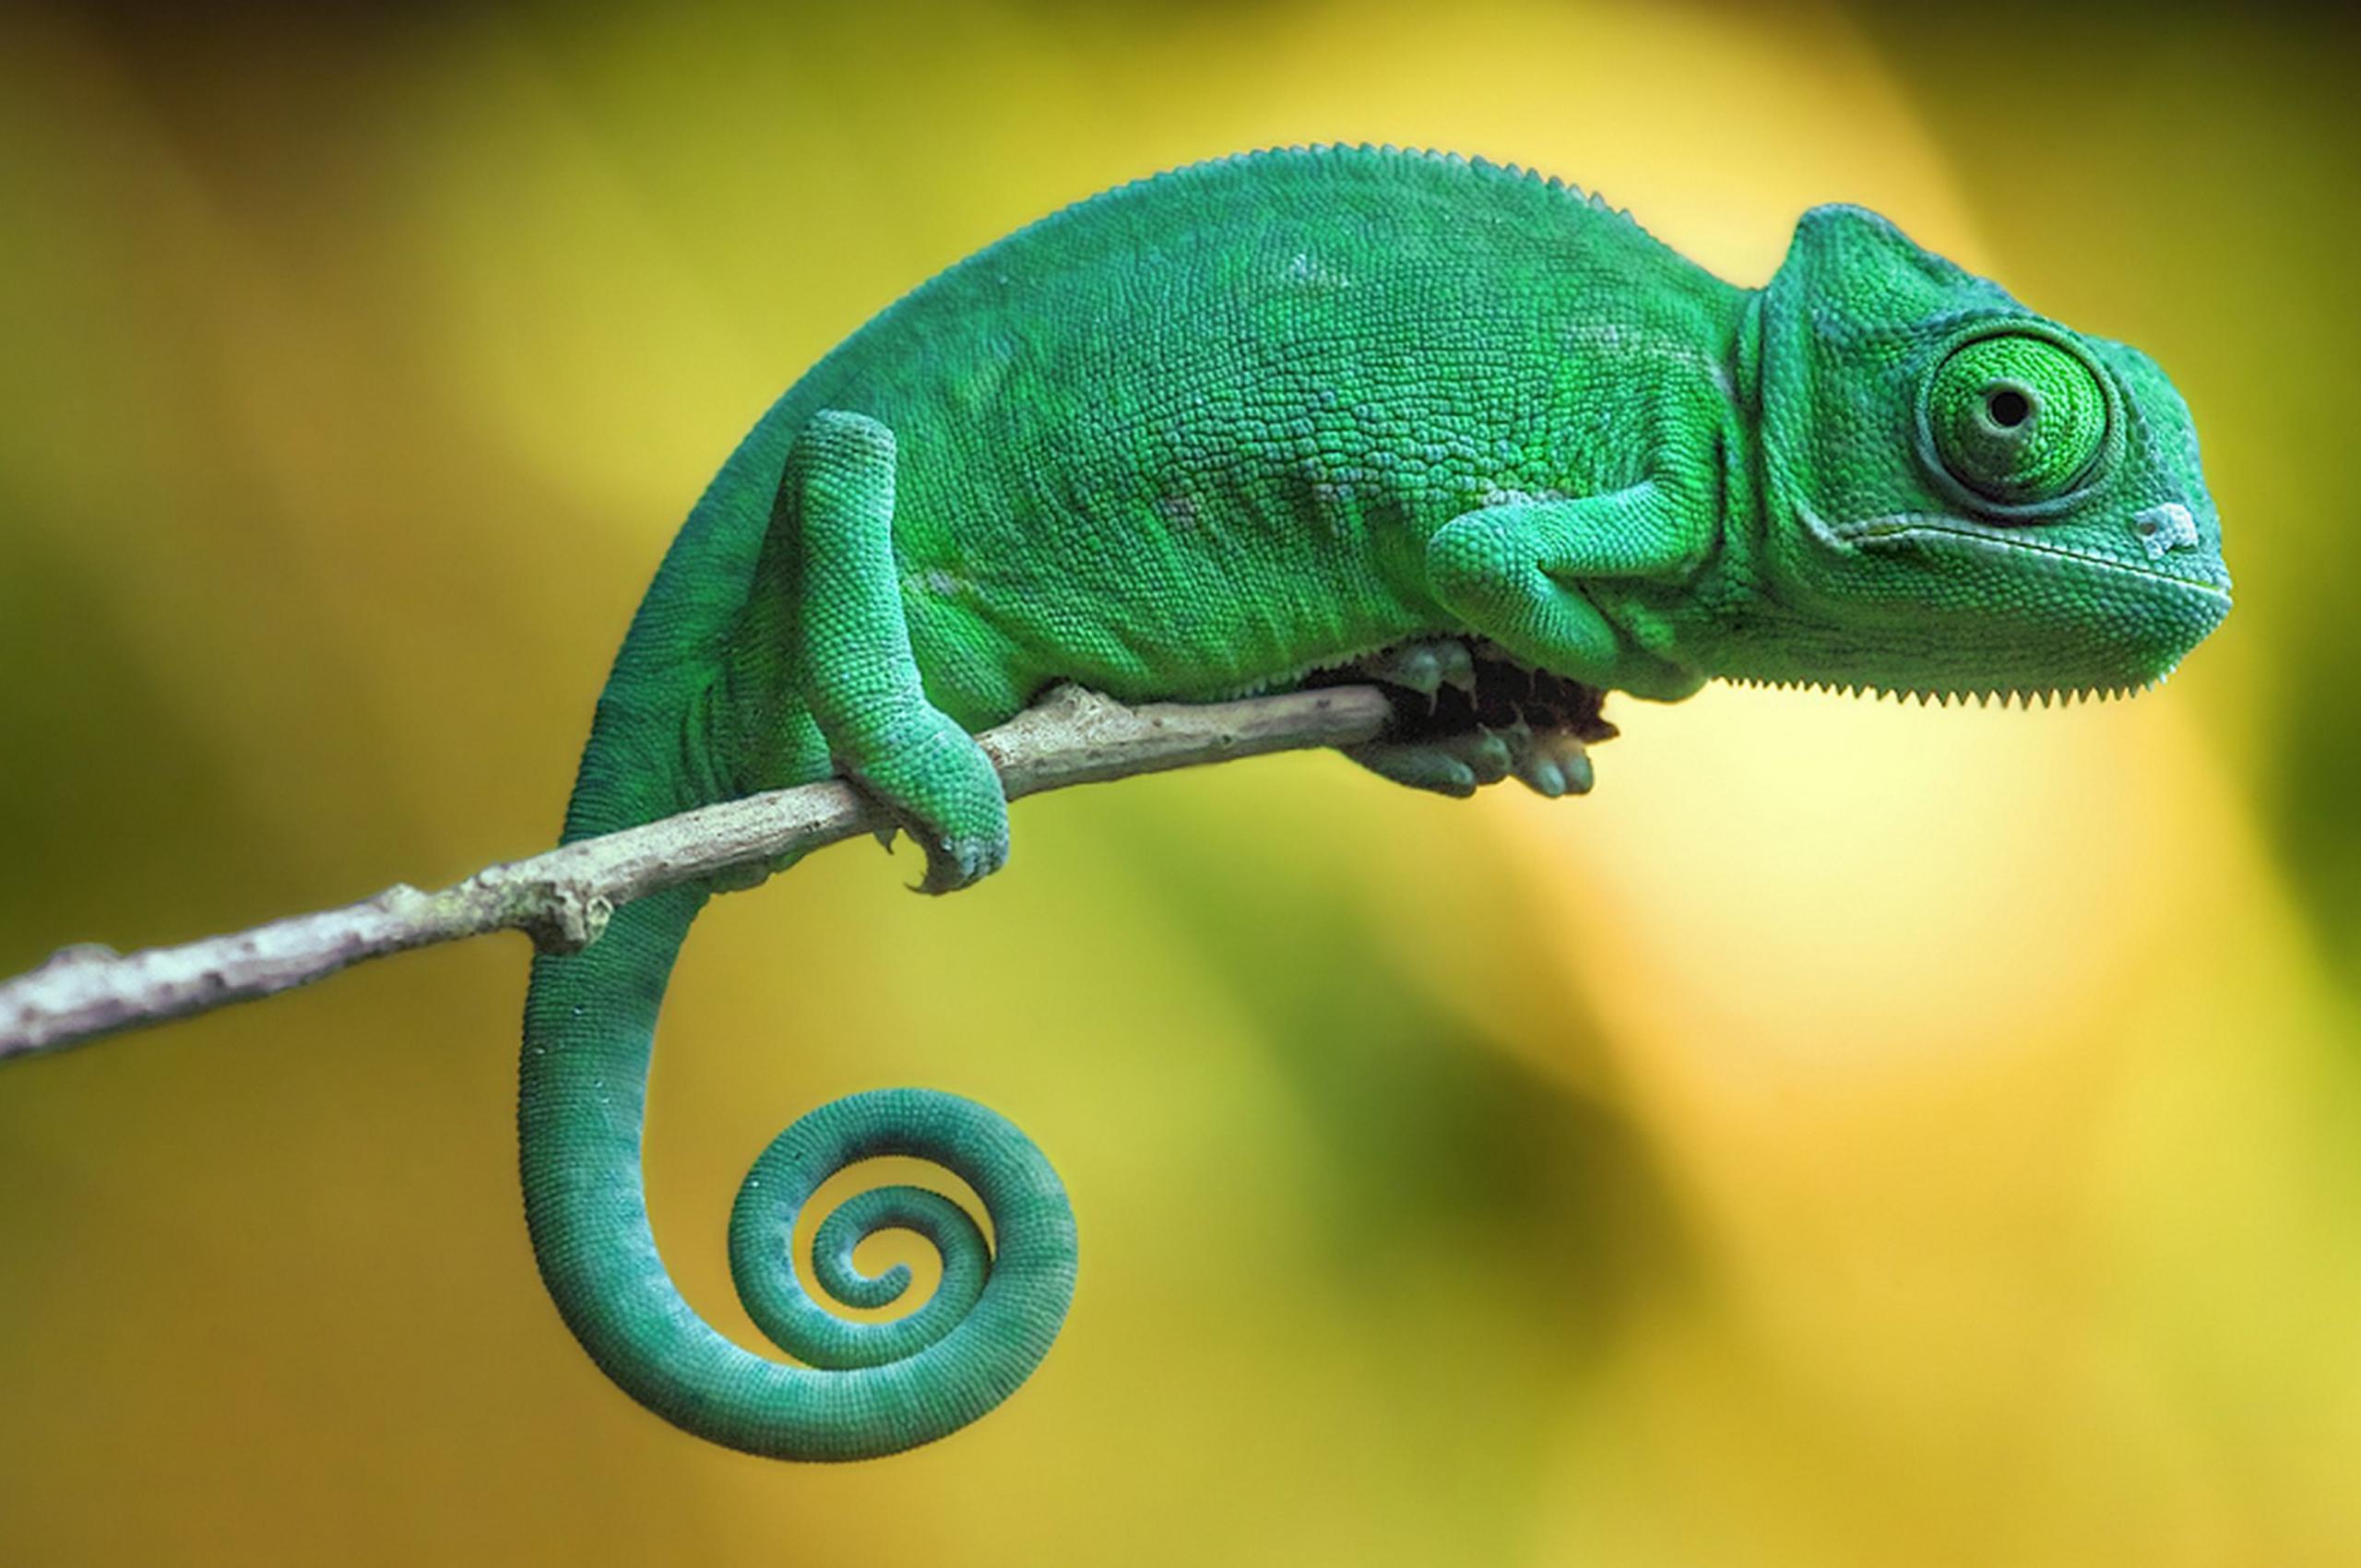 free download wallpaper chameleon 4k animals 14988 page 4